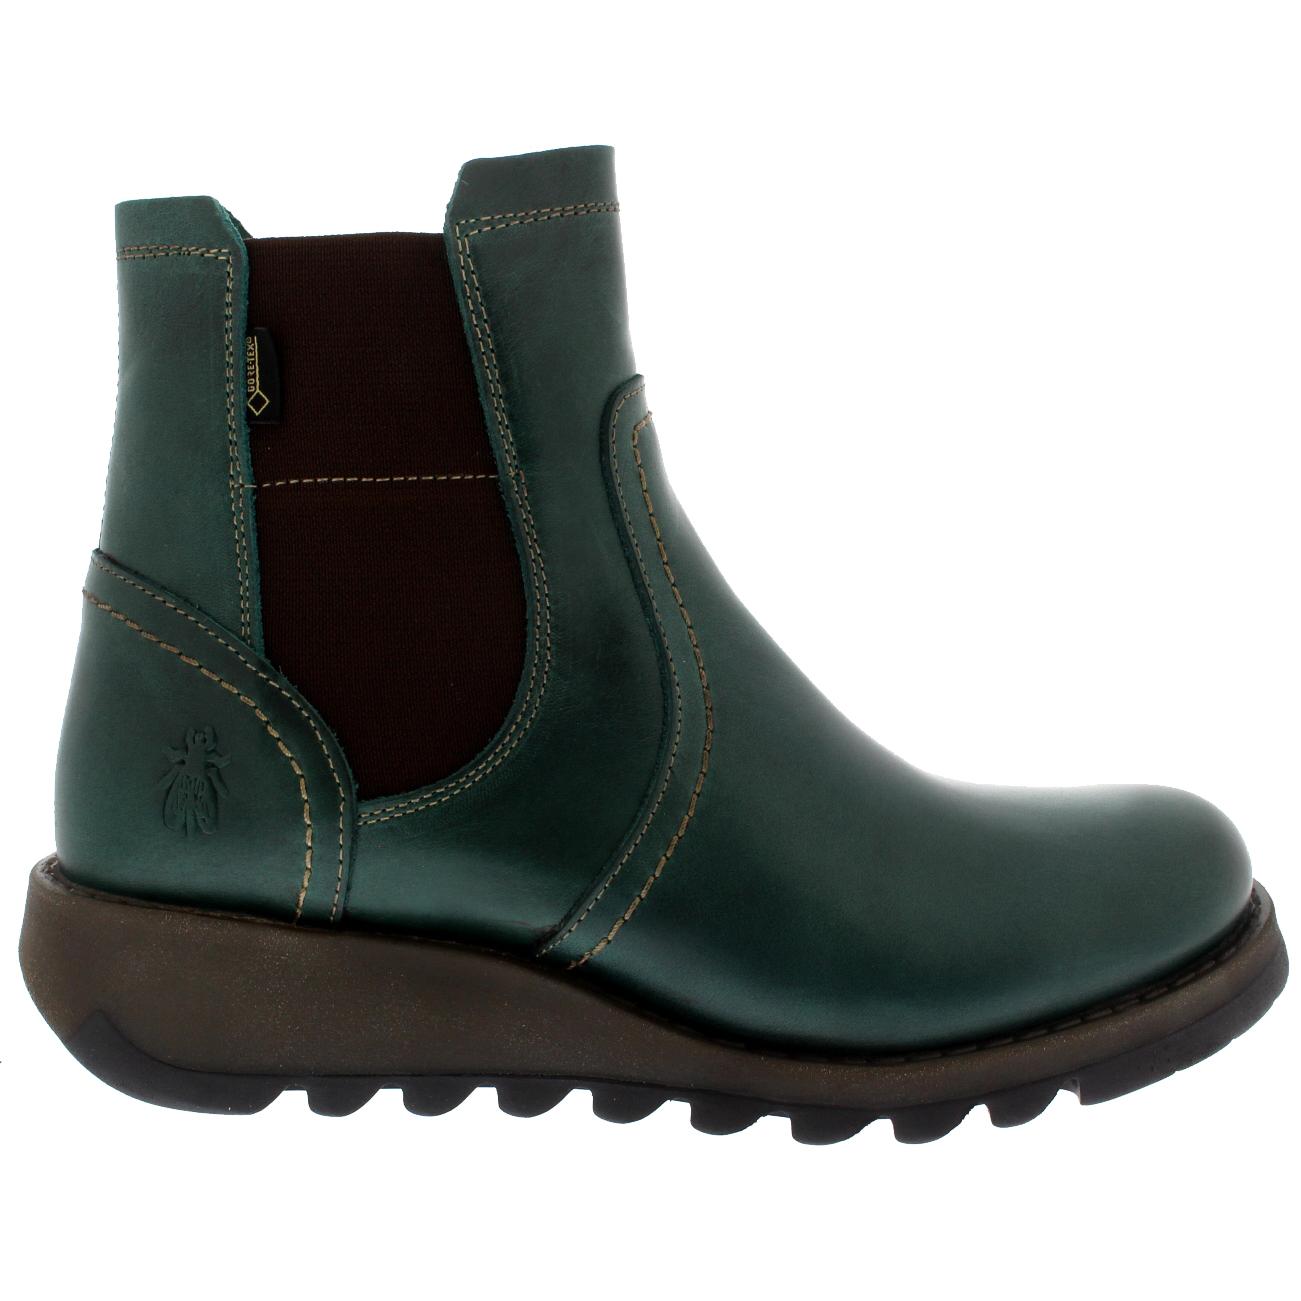 Damenschuhe Leder Fly London Scon Gore Tex Winter Ankle Stiefel Leder Damenschuhe Wedge Heels US 5-12 f39138